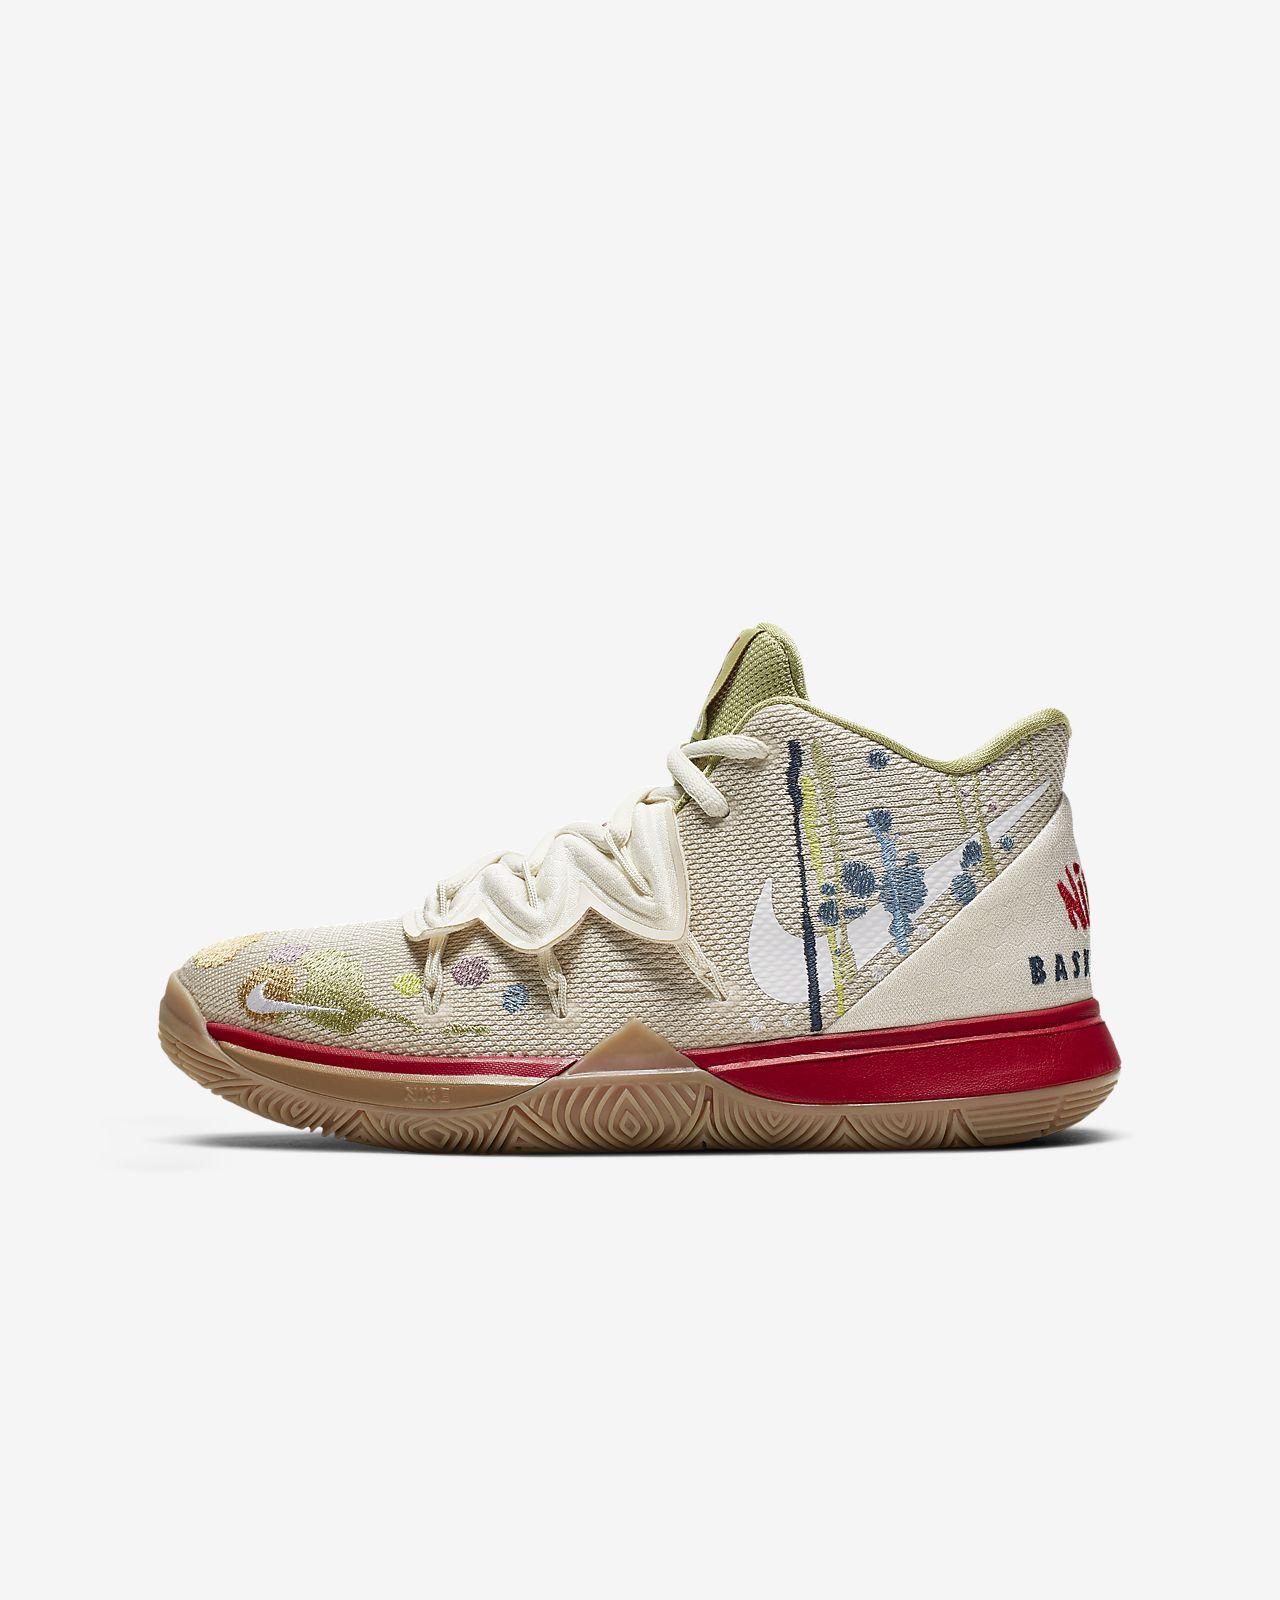 Kyrie 5 BANDULU Big Kids' Basketball Shoe